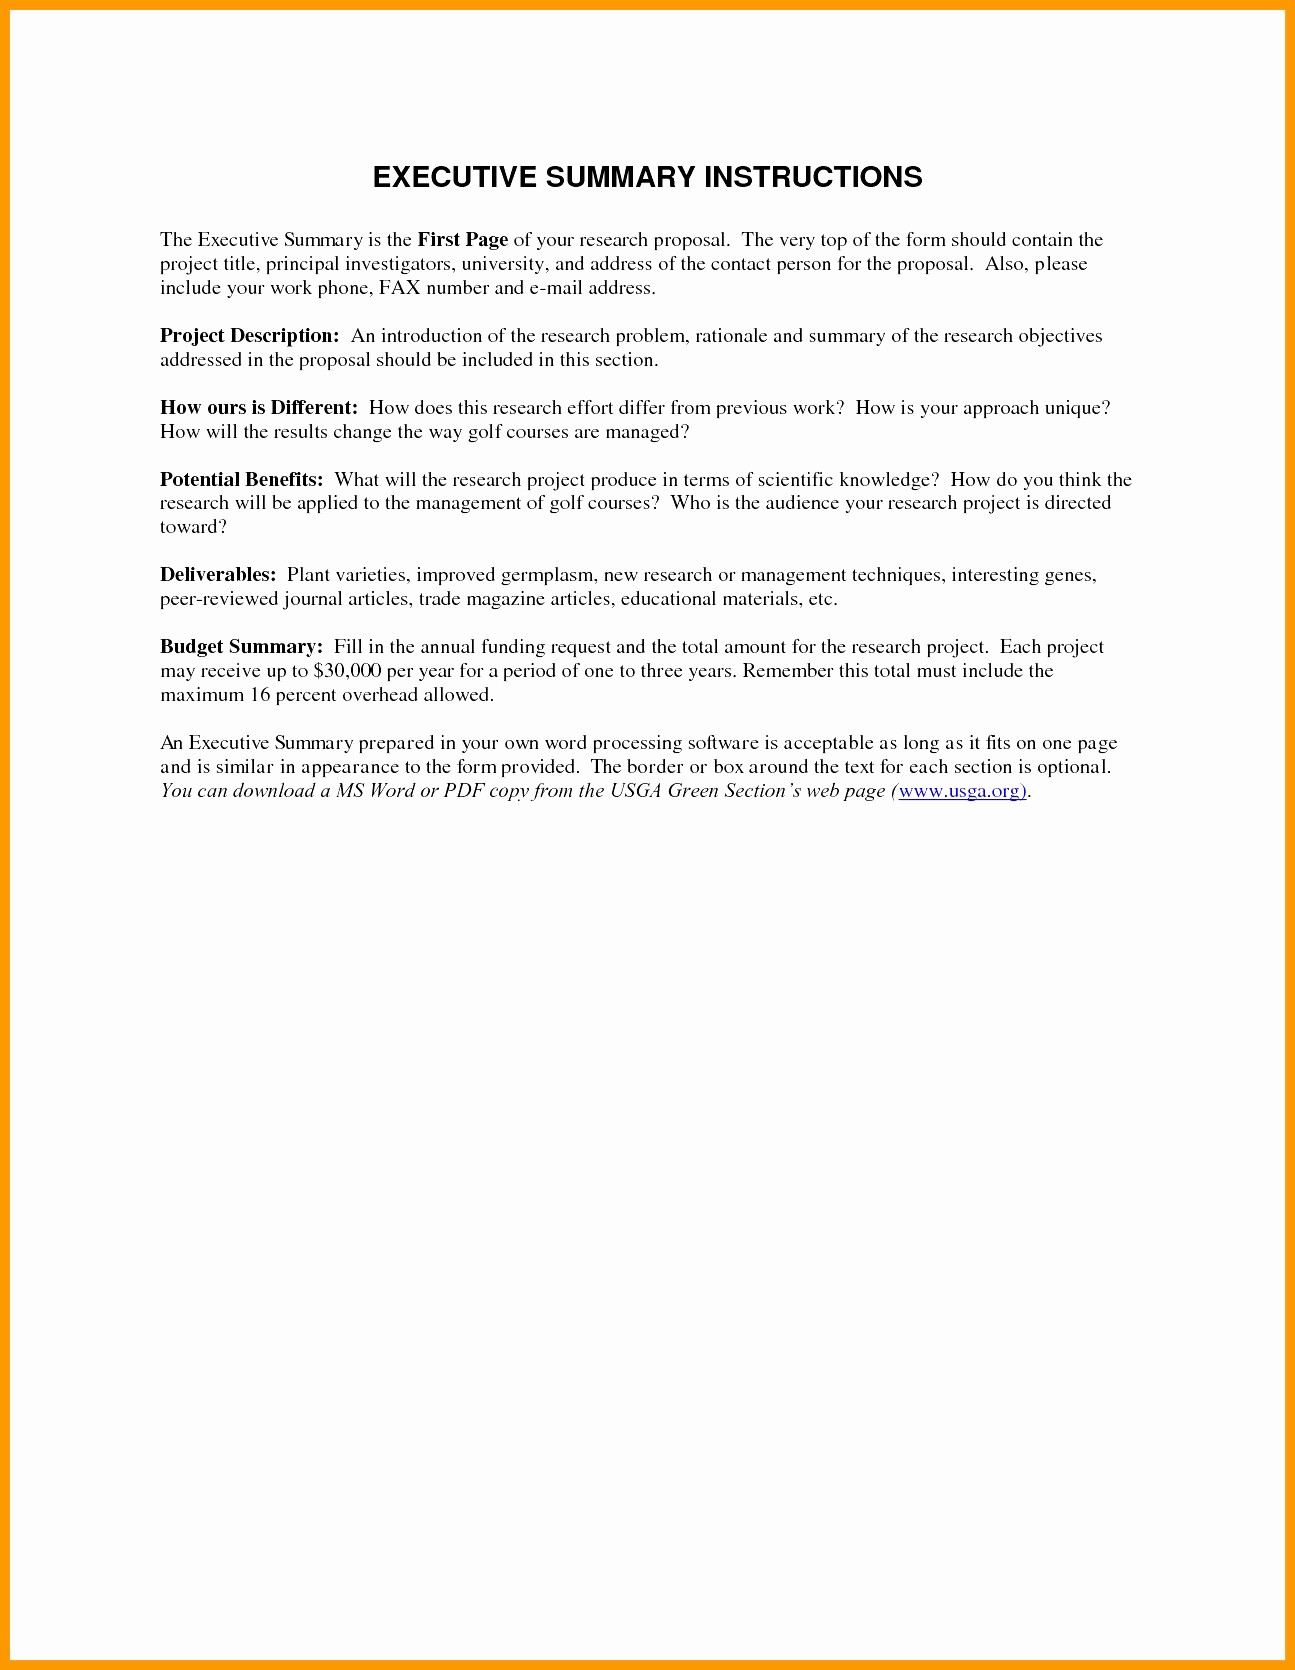 One Page Executive Summary Example Luxury E Page Executive Summary Sample 18 Band Ible